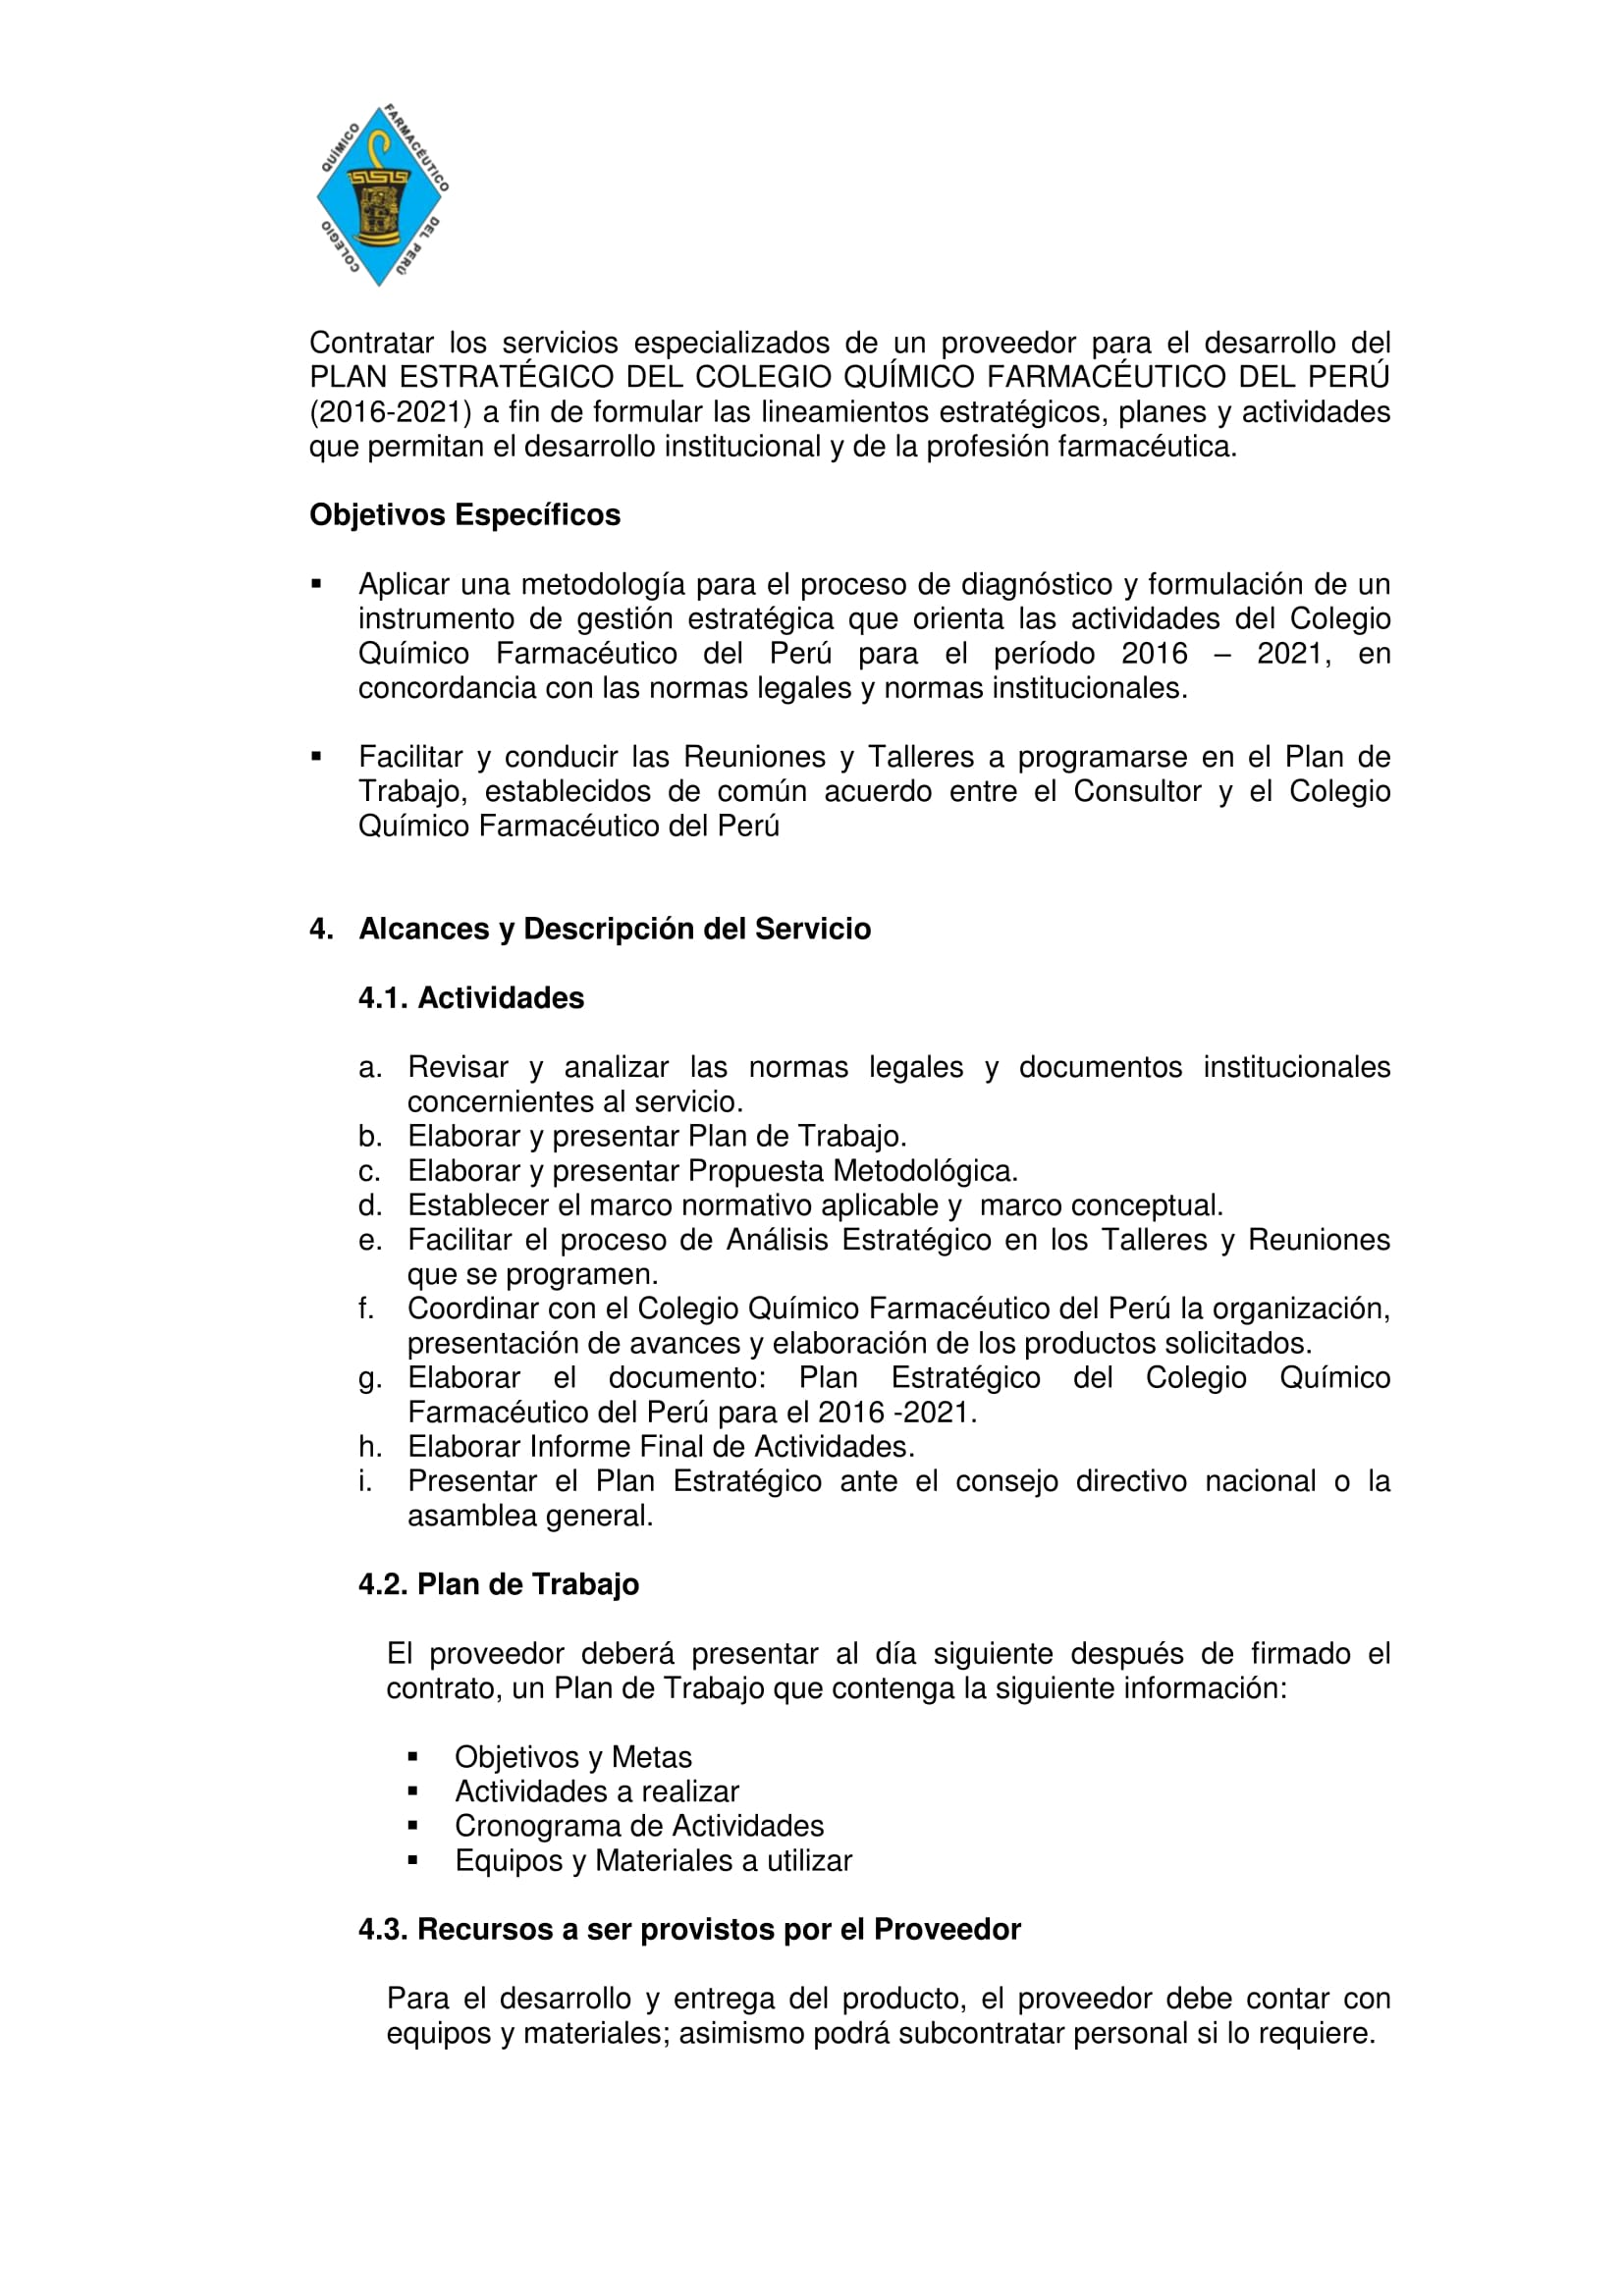 tdr-plan-estrategico-cqfp-2